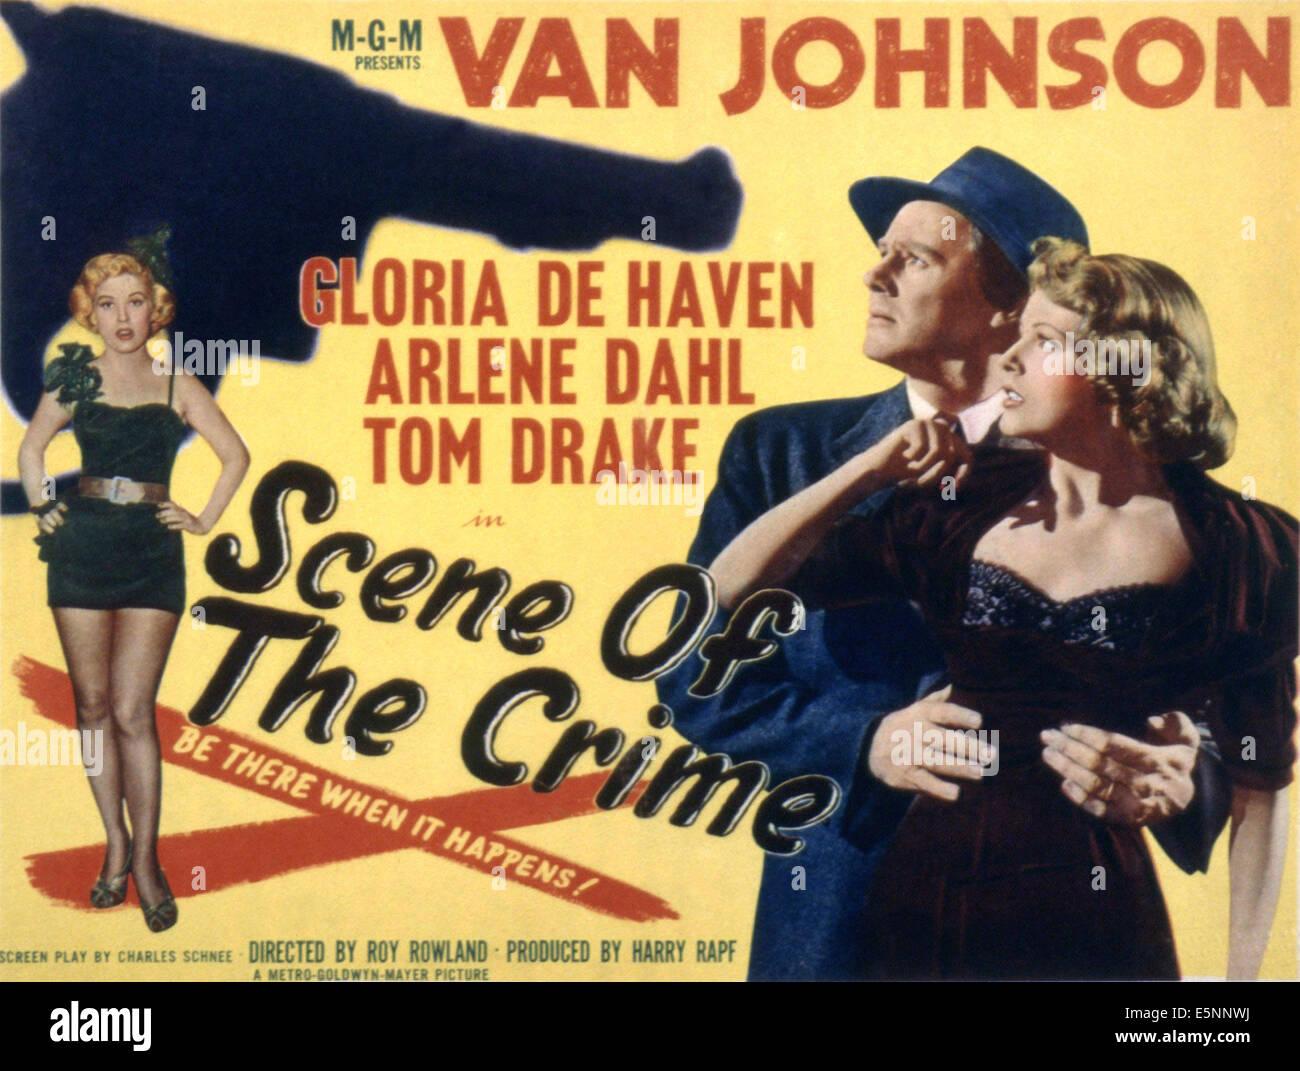 SCENE OF THE CRIME, Gloria DeHaven, Van Johnson, Arlene Dahl, 1949 Stock Photo